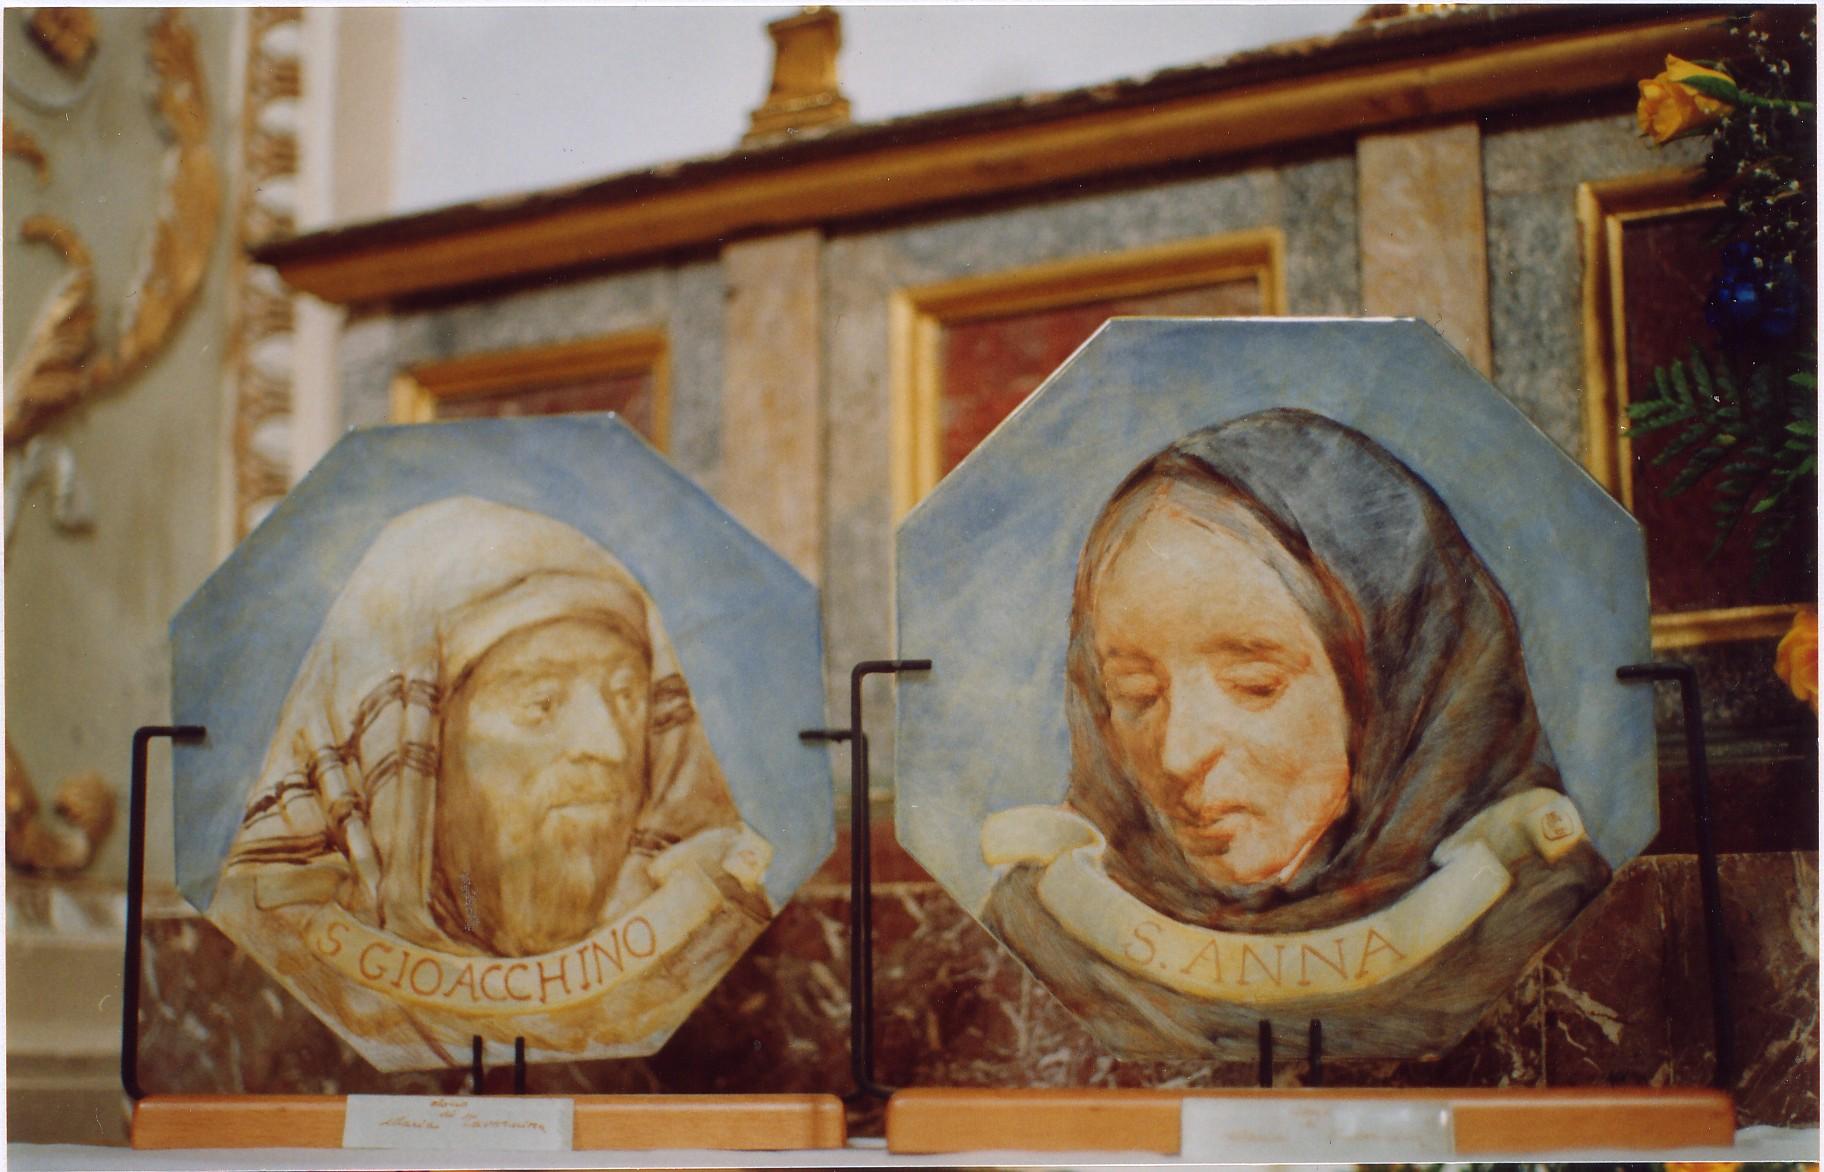 Sant'Anna e San Gioacchino